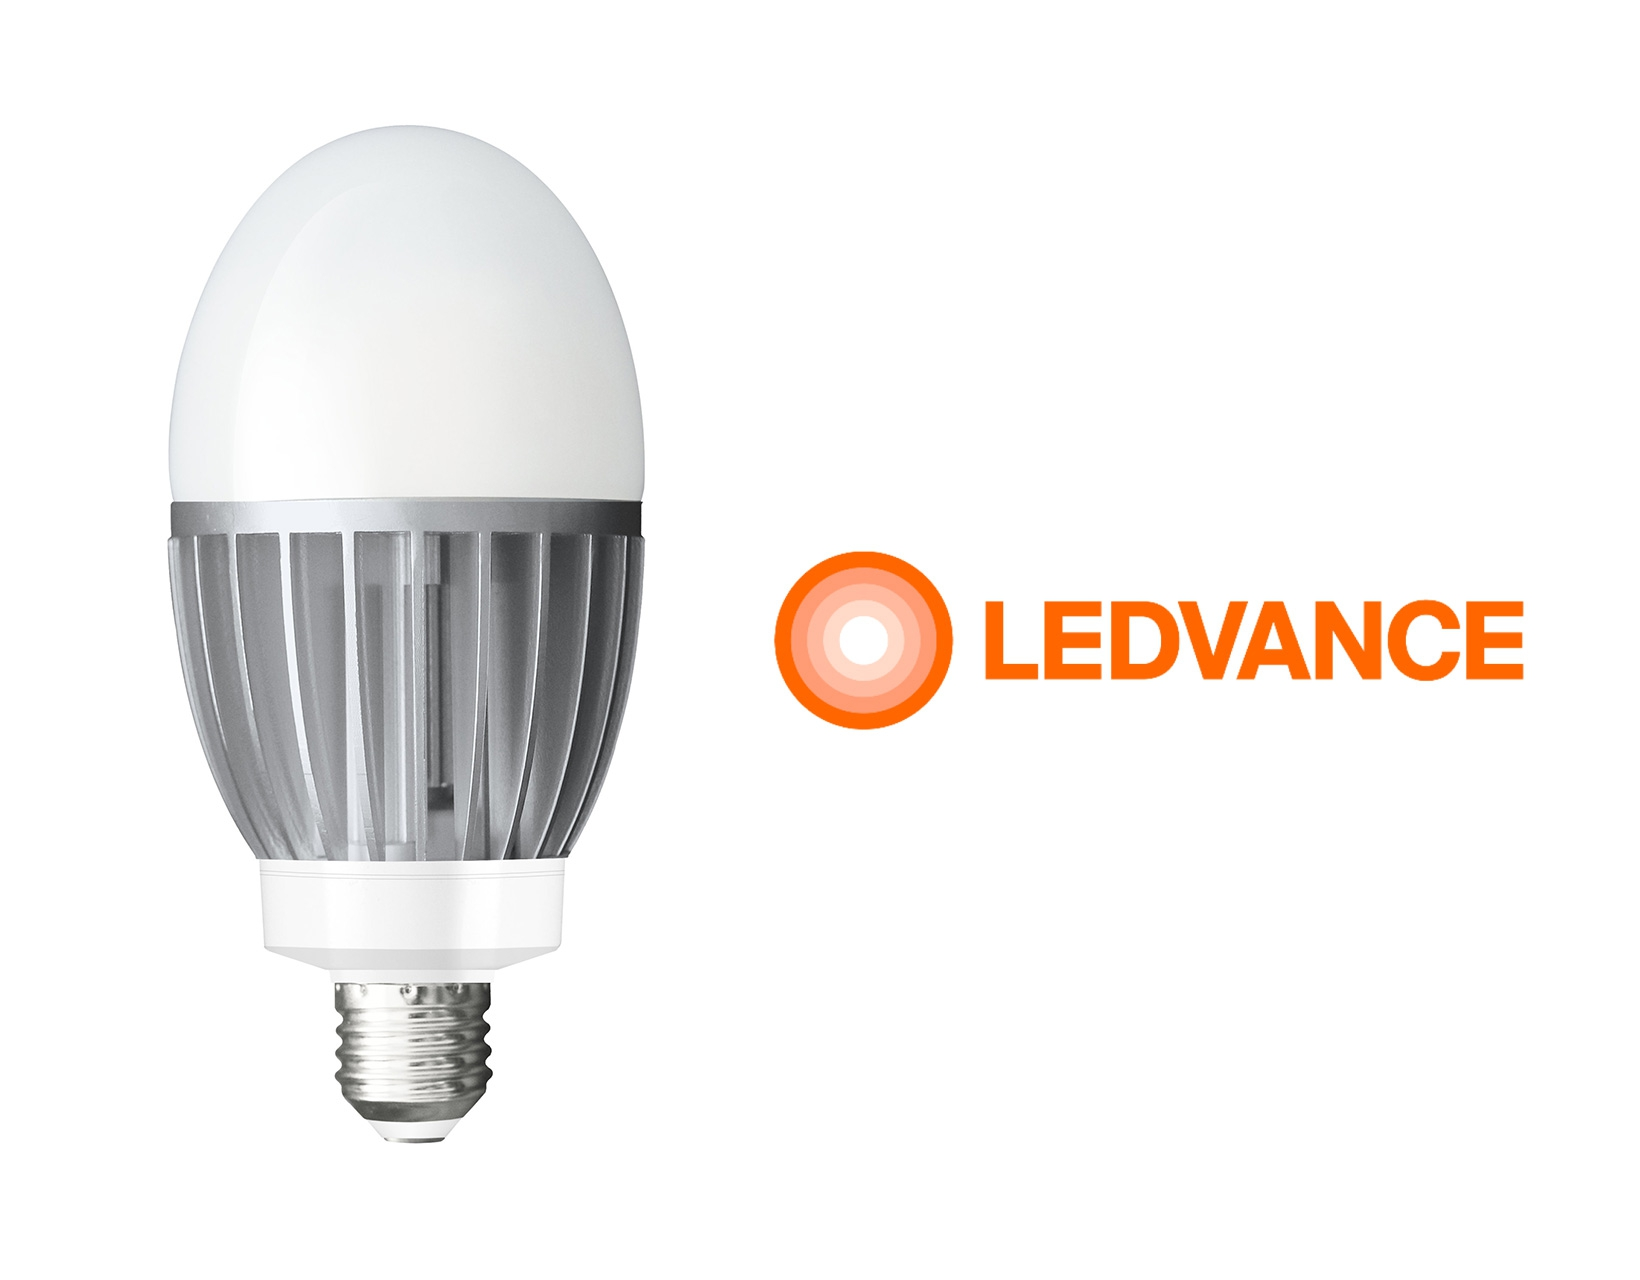 Nuevas lámparas LEDVANCE para alumbrado público